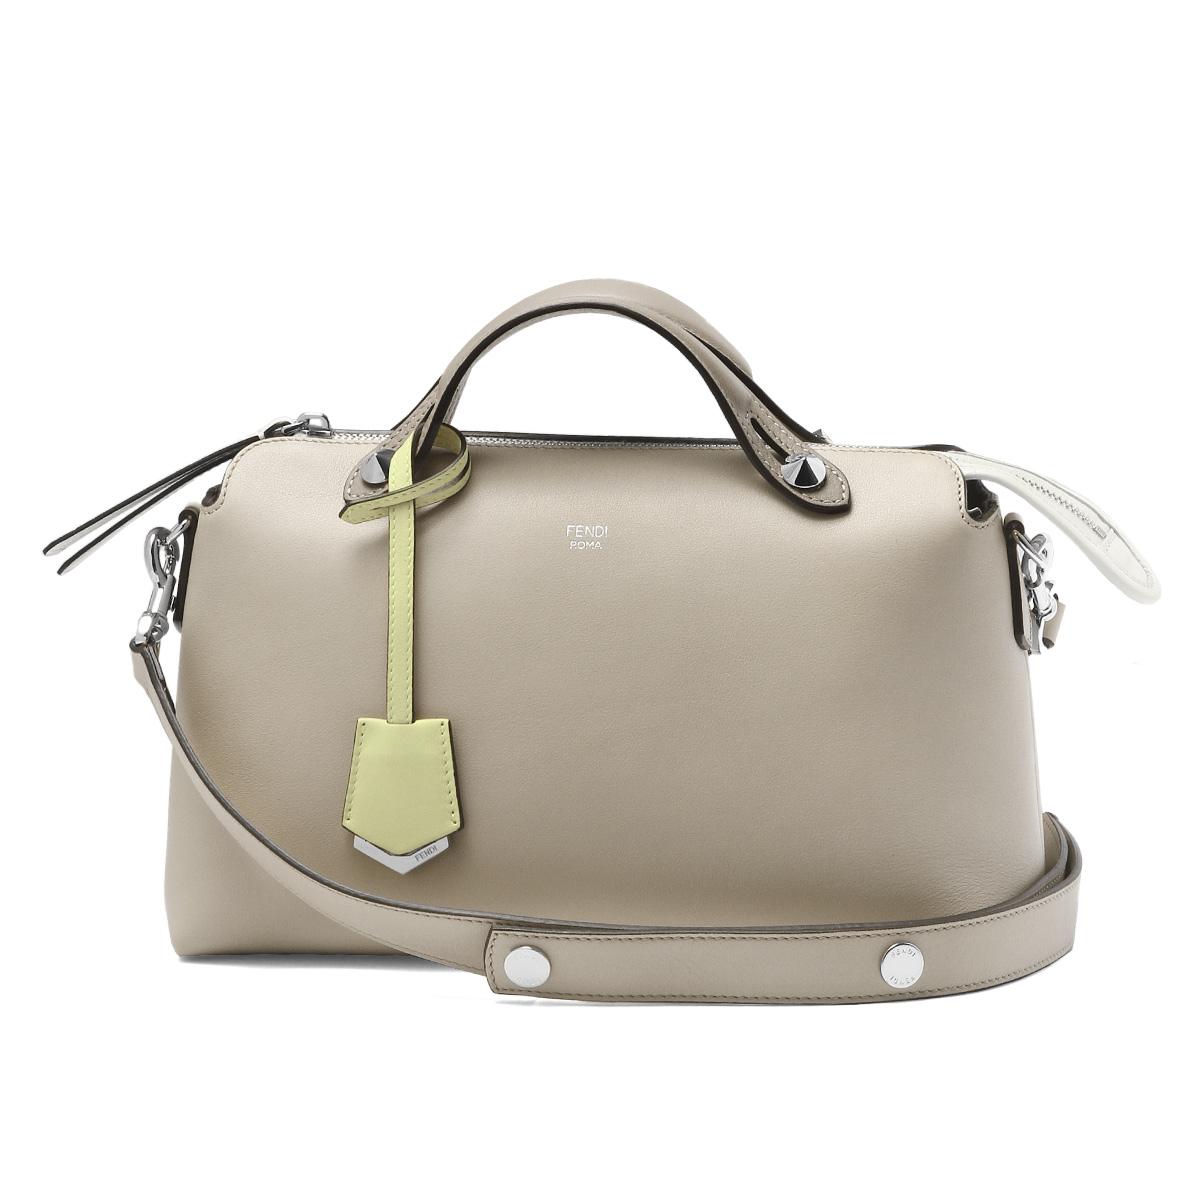 Fendi FENDI Bag Lady 8BL124 5QJ F136L Shoulder Handbag Small BY THE WAY Visor Way NUVOLA TORT MLC P Beige Belonging To